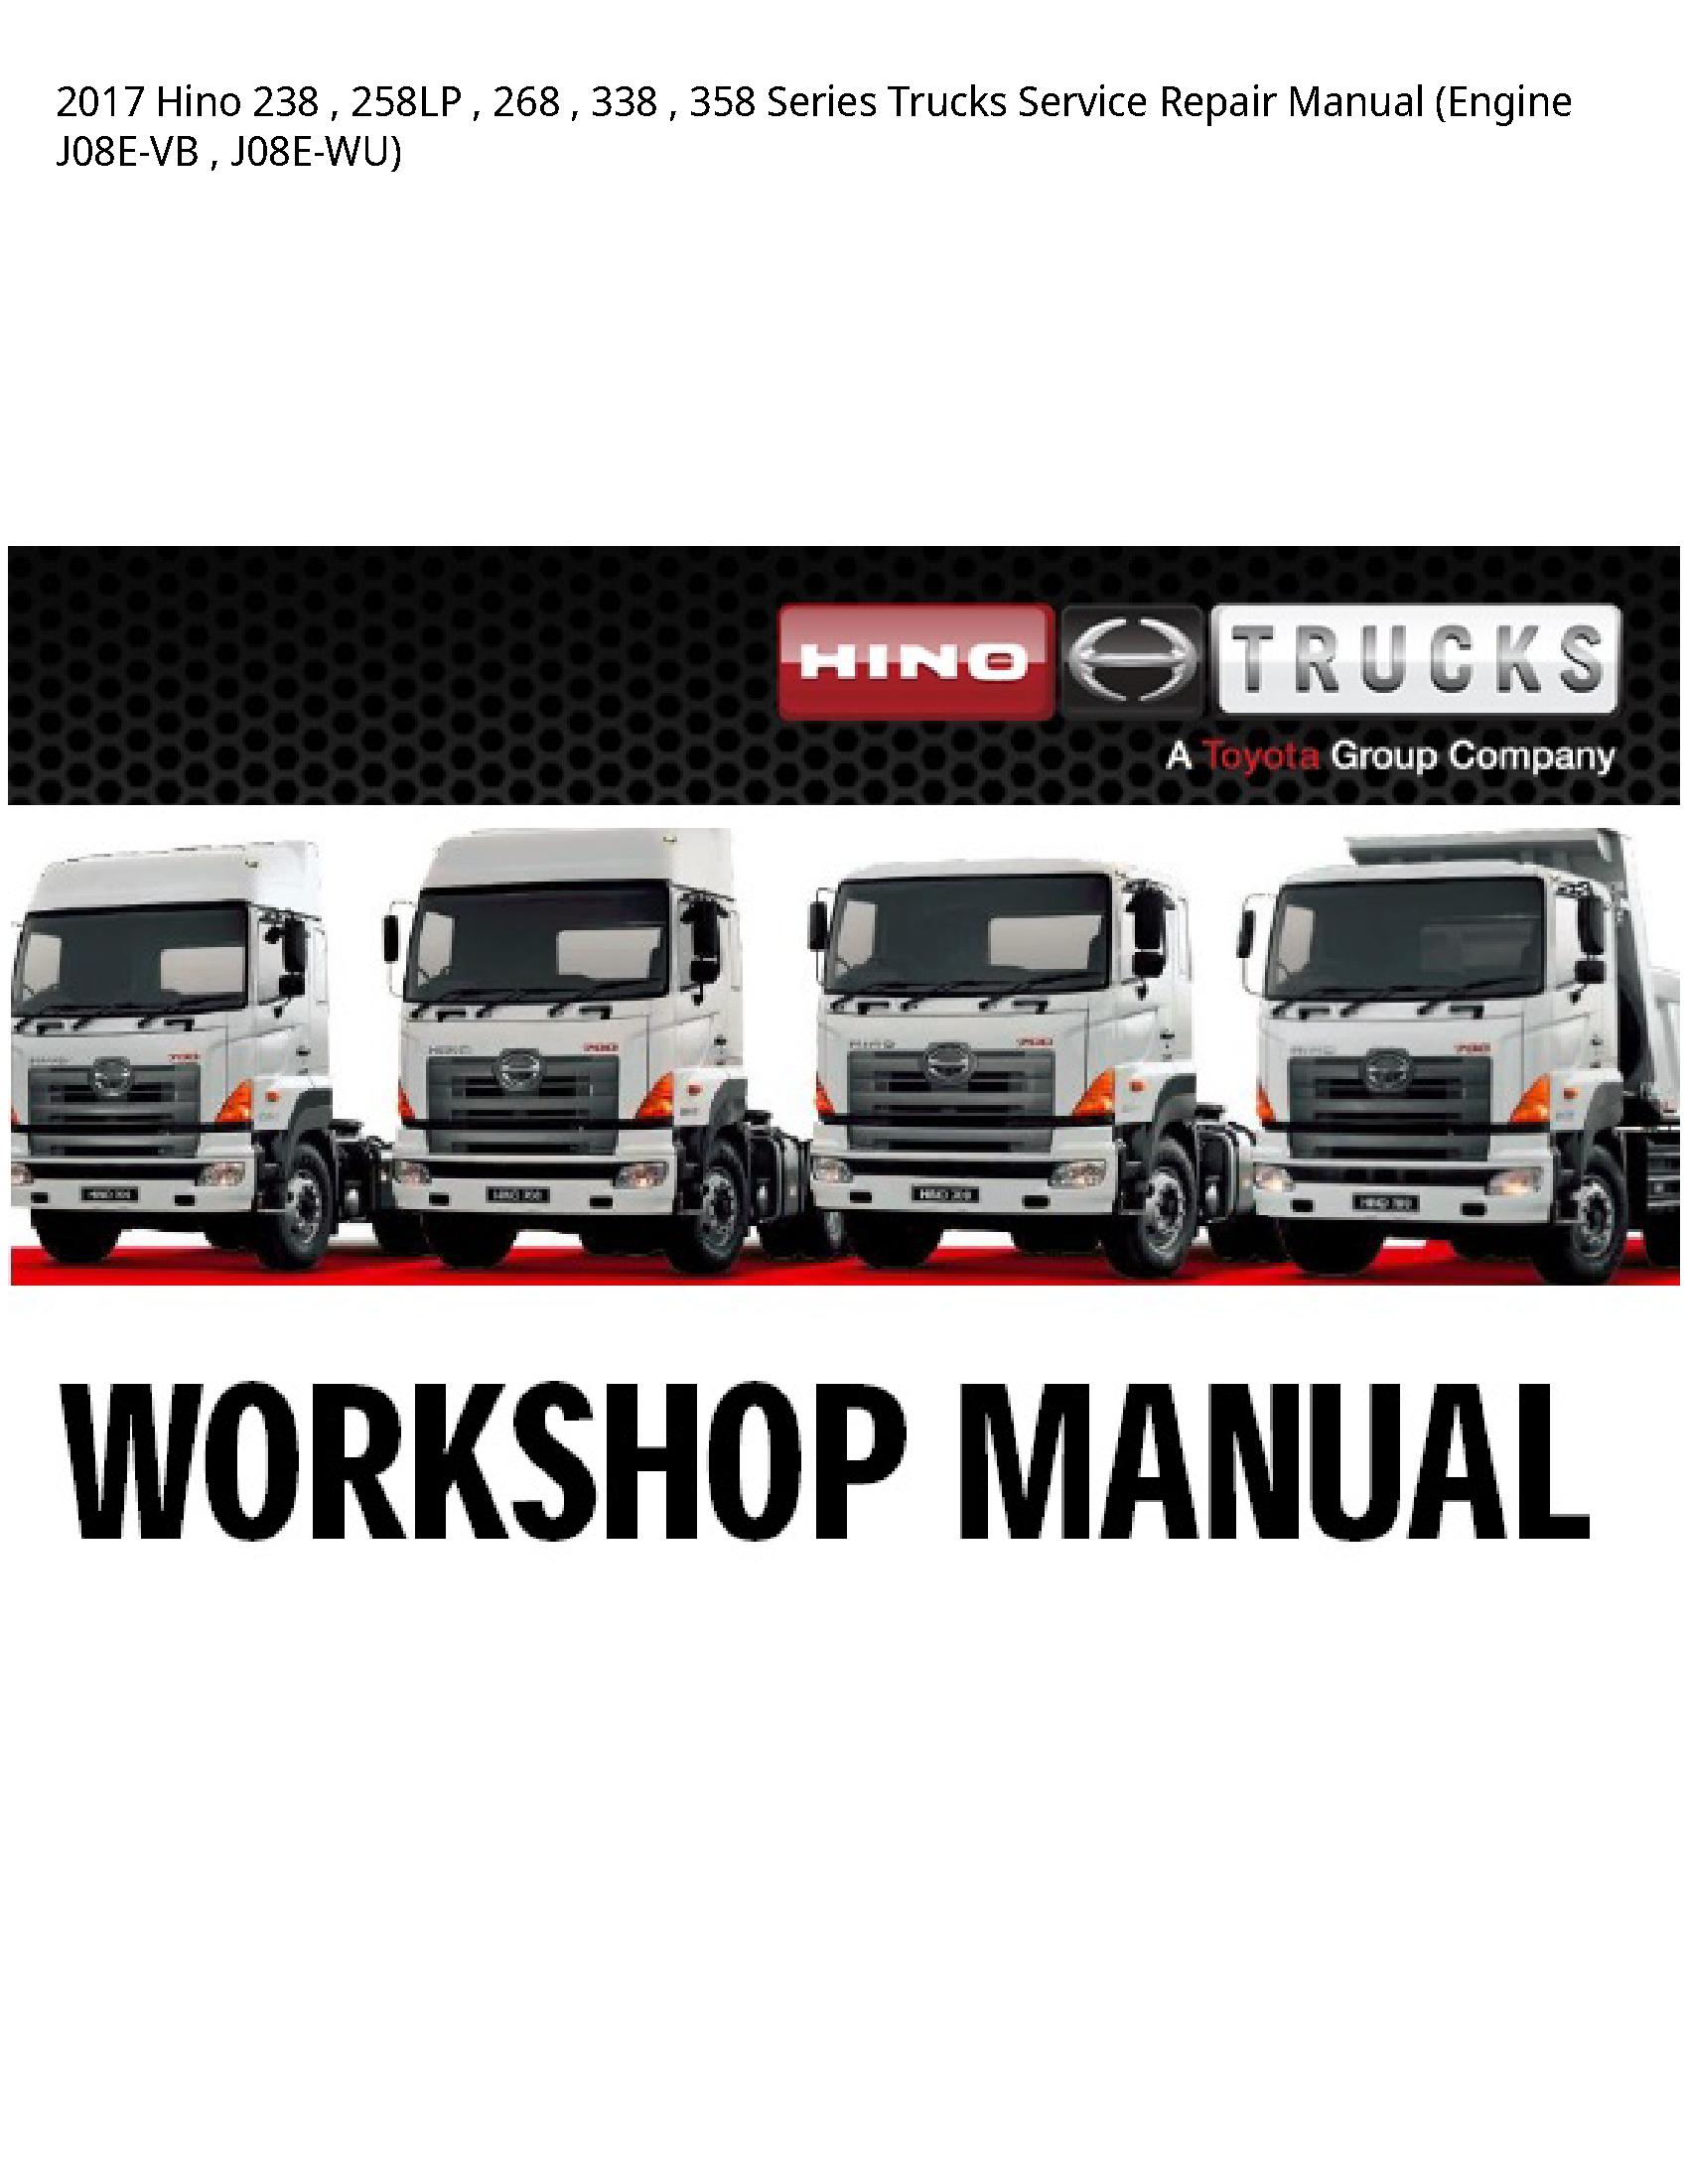 Hino 238 Series Trucks manual